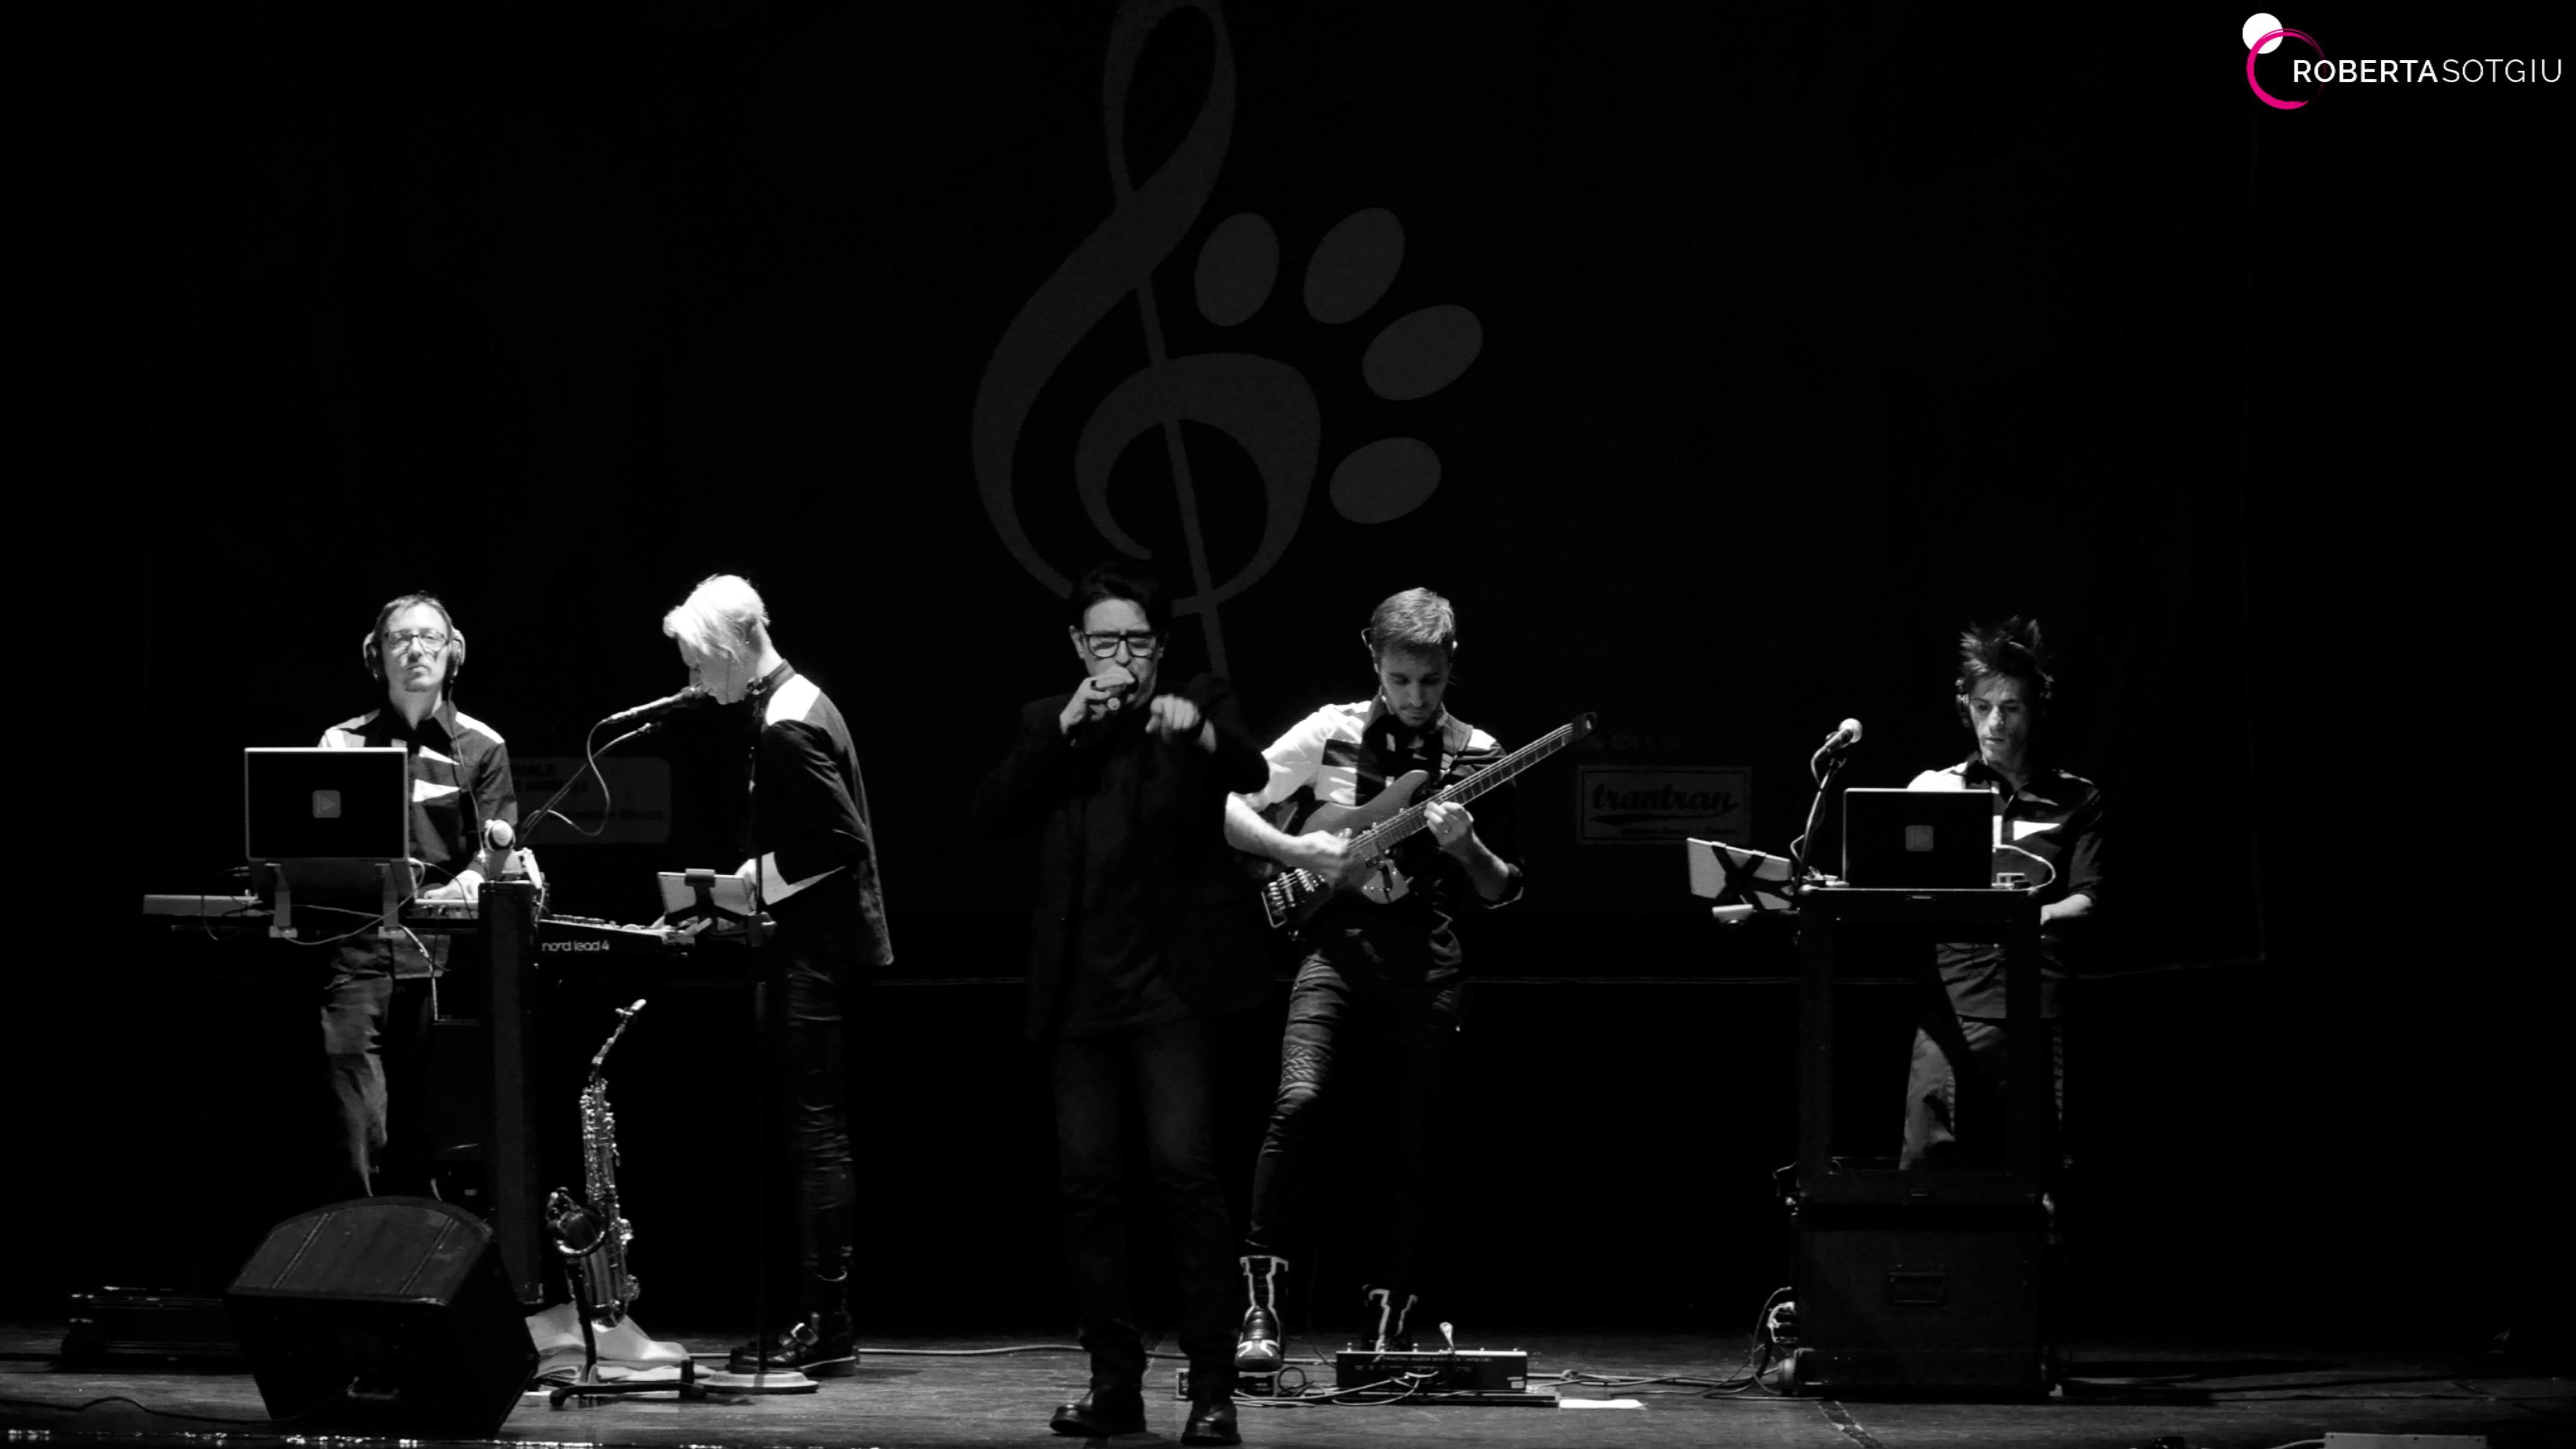 Monza for Animals 2014 – 16 dicembre 2014 – Teatro Binario 7, Monza